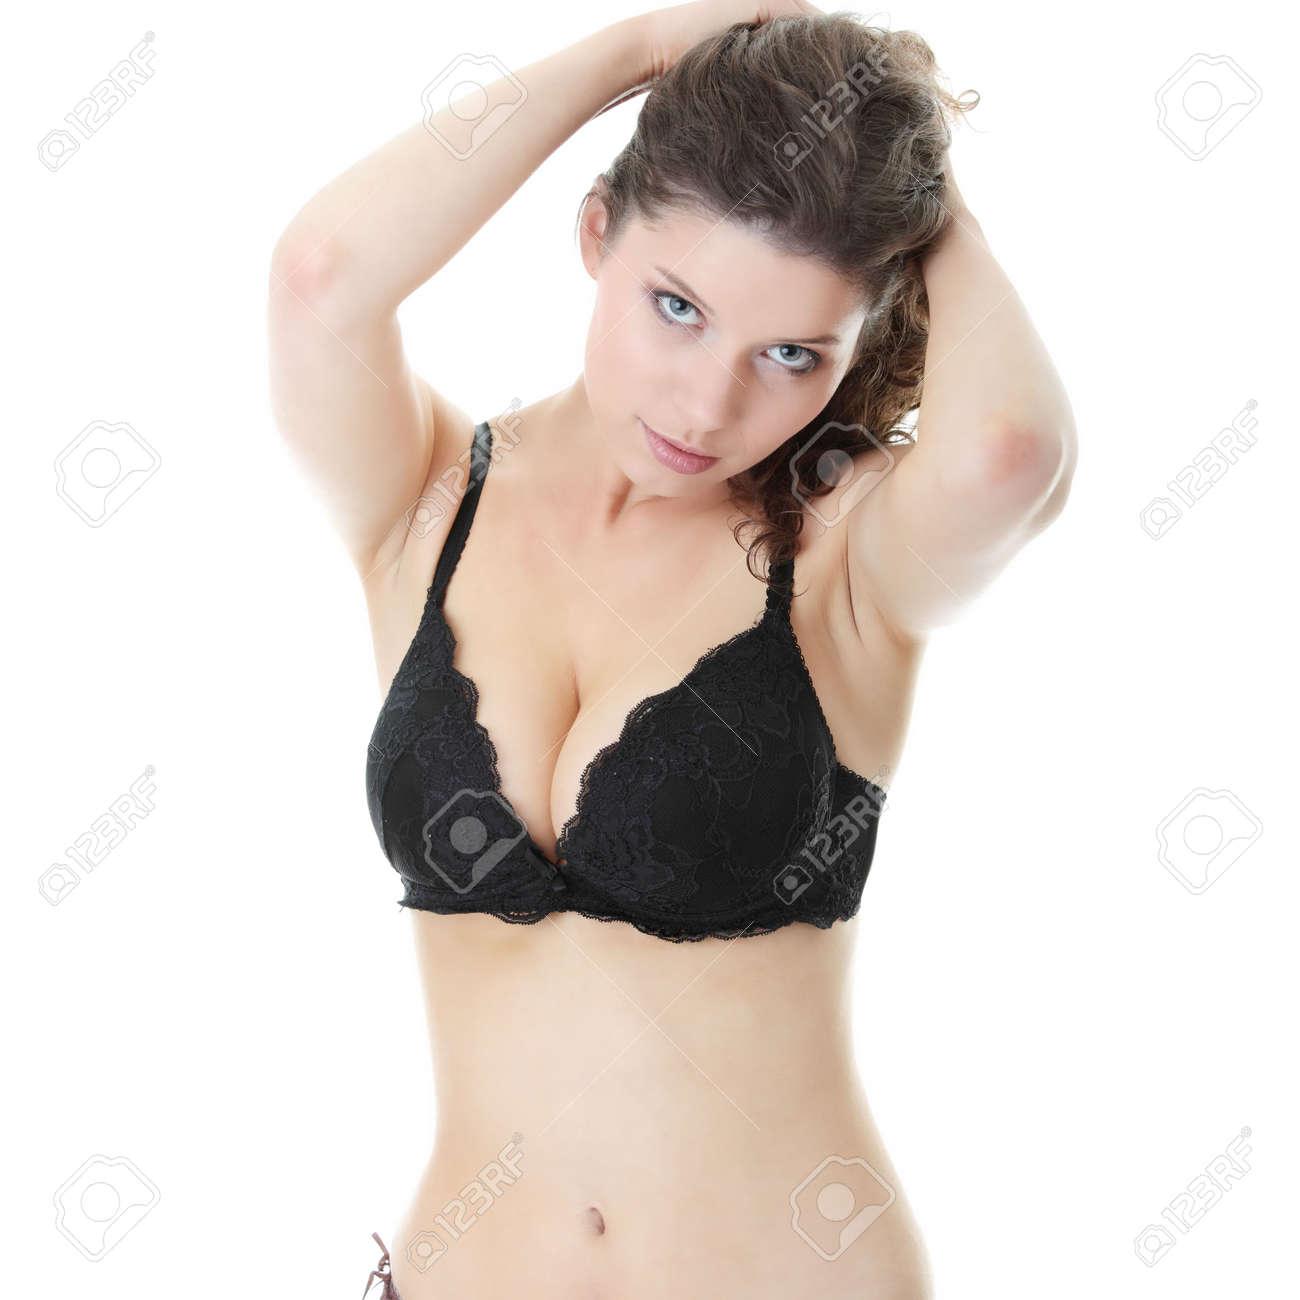 Katrina bikini girl darrell pics